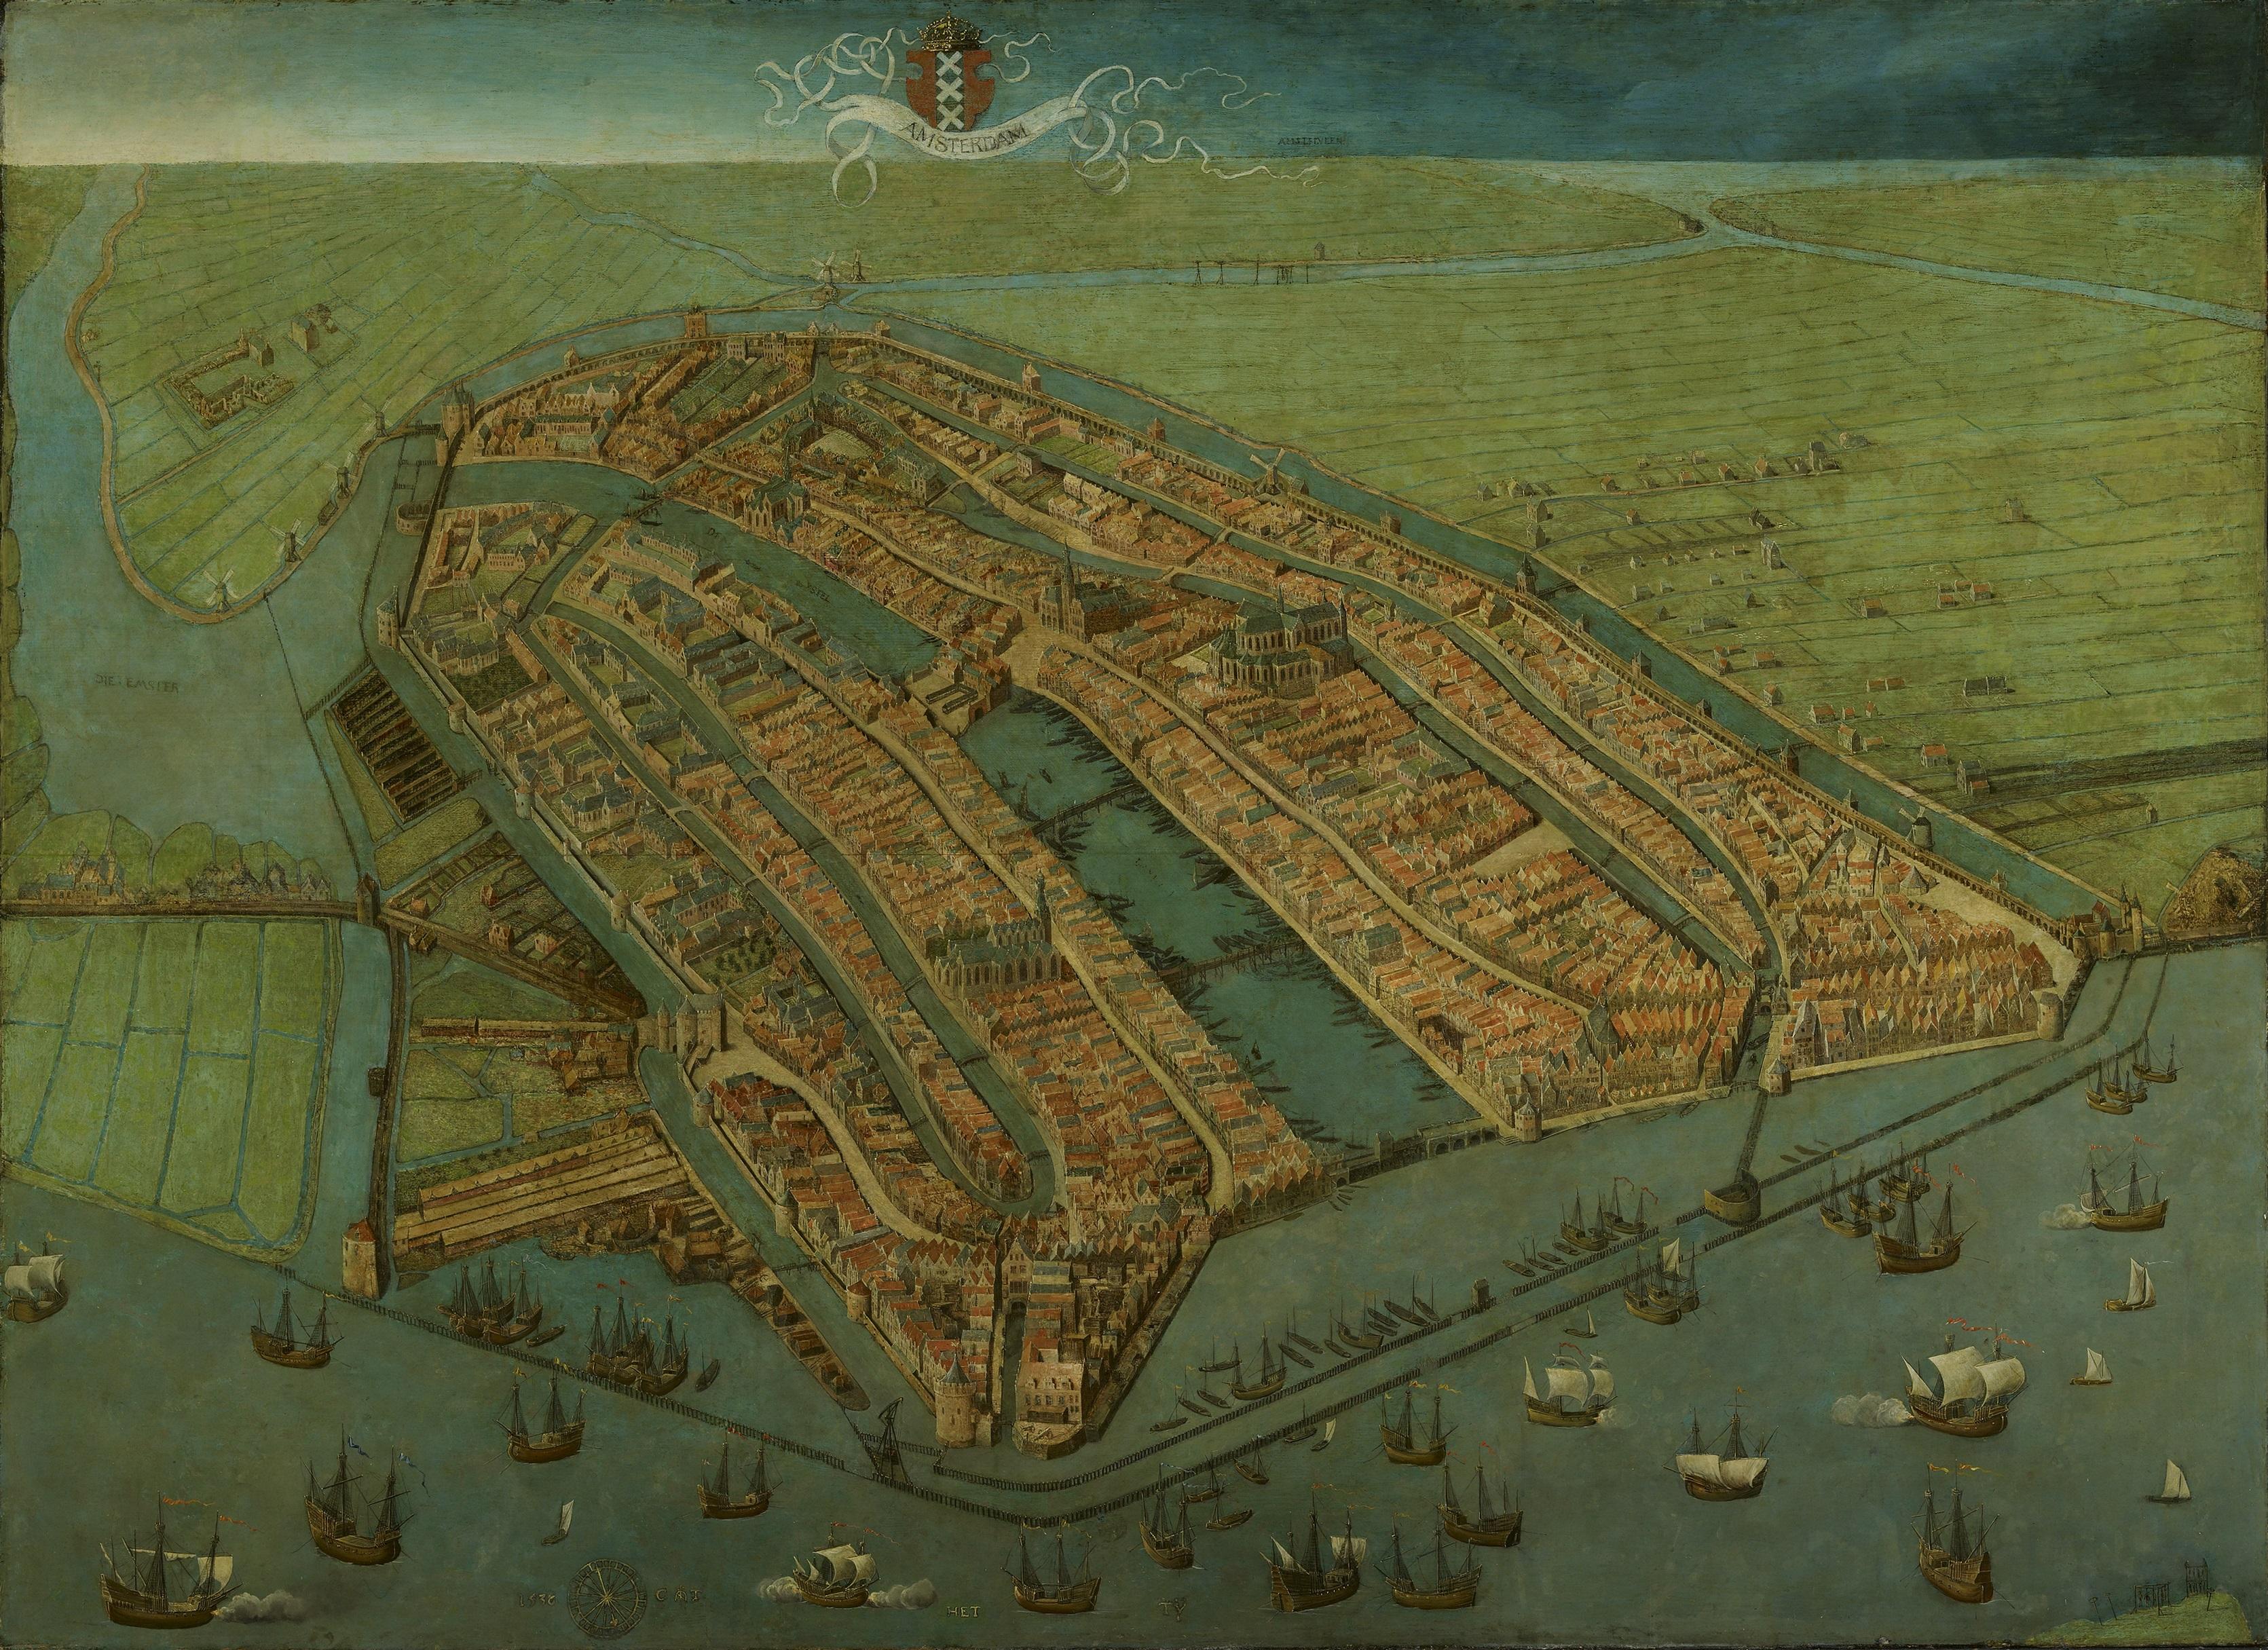 FileView Of AmsterdamJPG Wikimedia Commons - Amsterdam old map